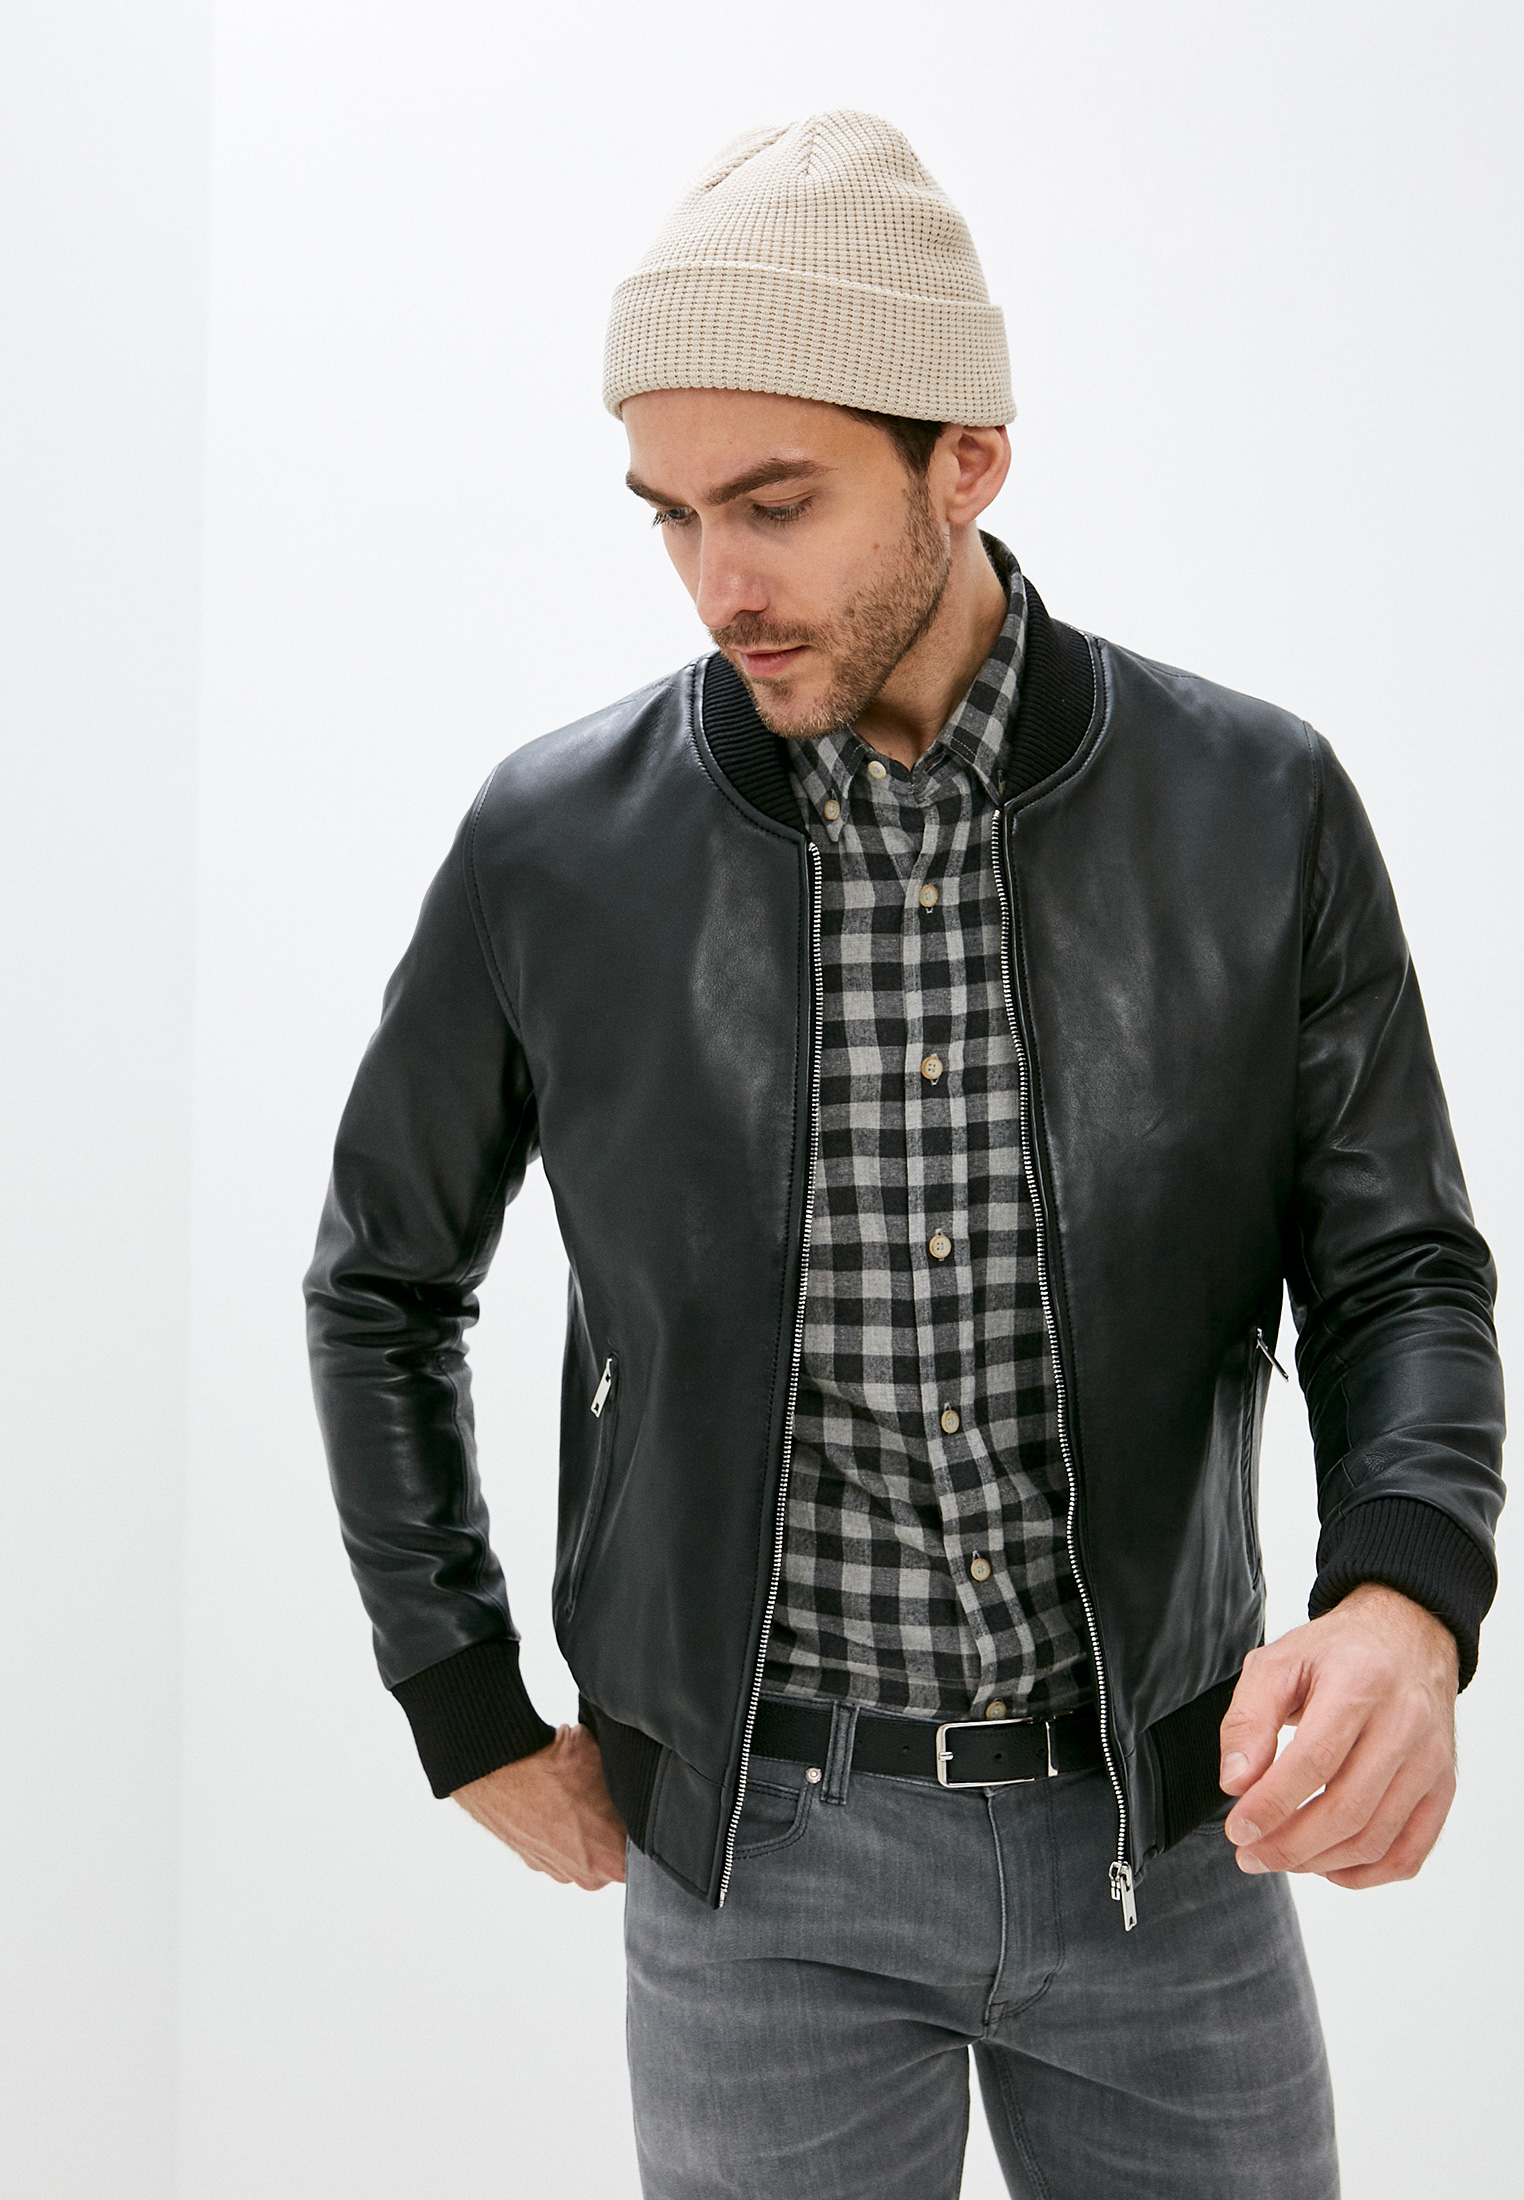 Кожаная куртка Serge Pariente Куртка кожаная Serge Pariente